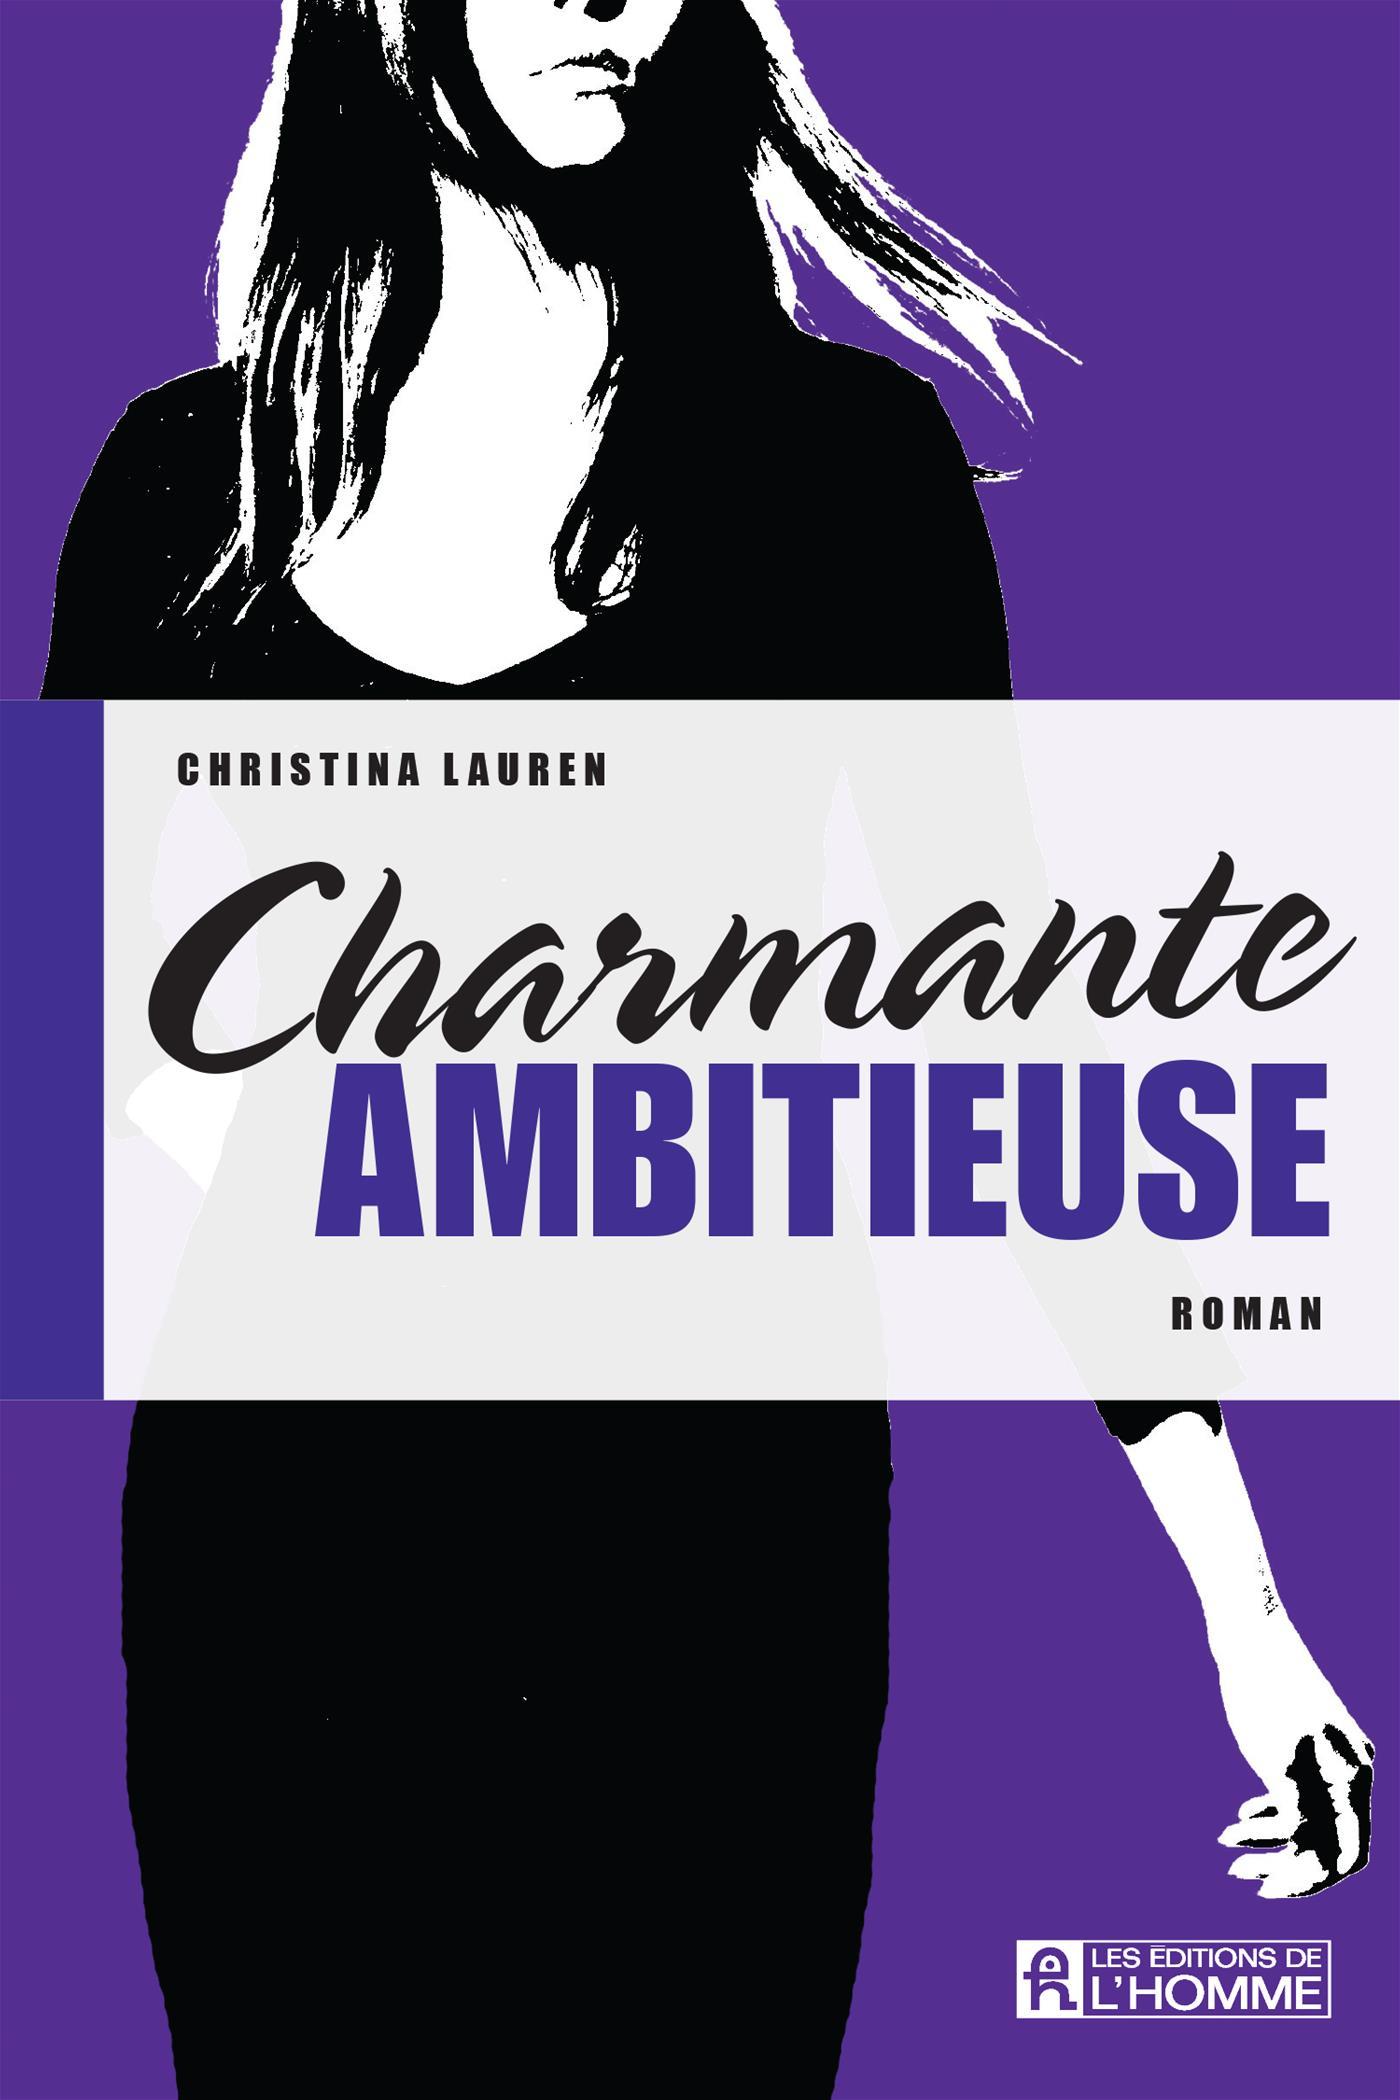 Charmante ambitieuse